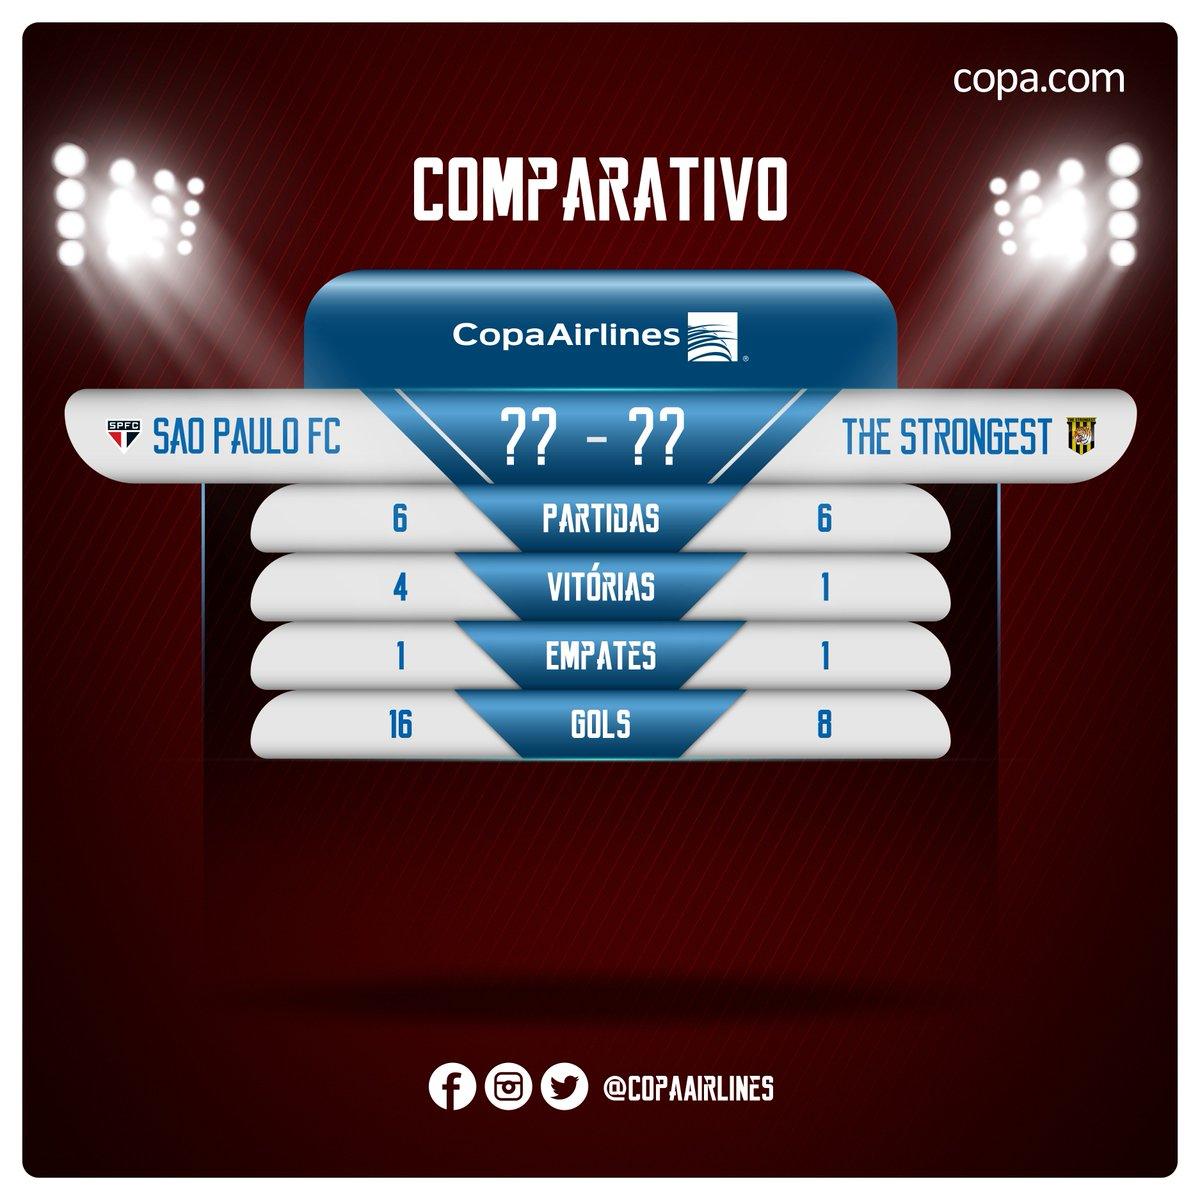 RT @CopaAirlines: Vamos @SaoPauloFC jogar com raça, para avançar nesta Libertadores! #CopaÉTricolor #IssoÉSaoPaulo https://t.co/OXrQDOag1Y